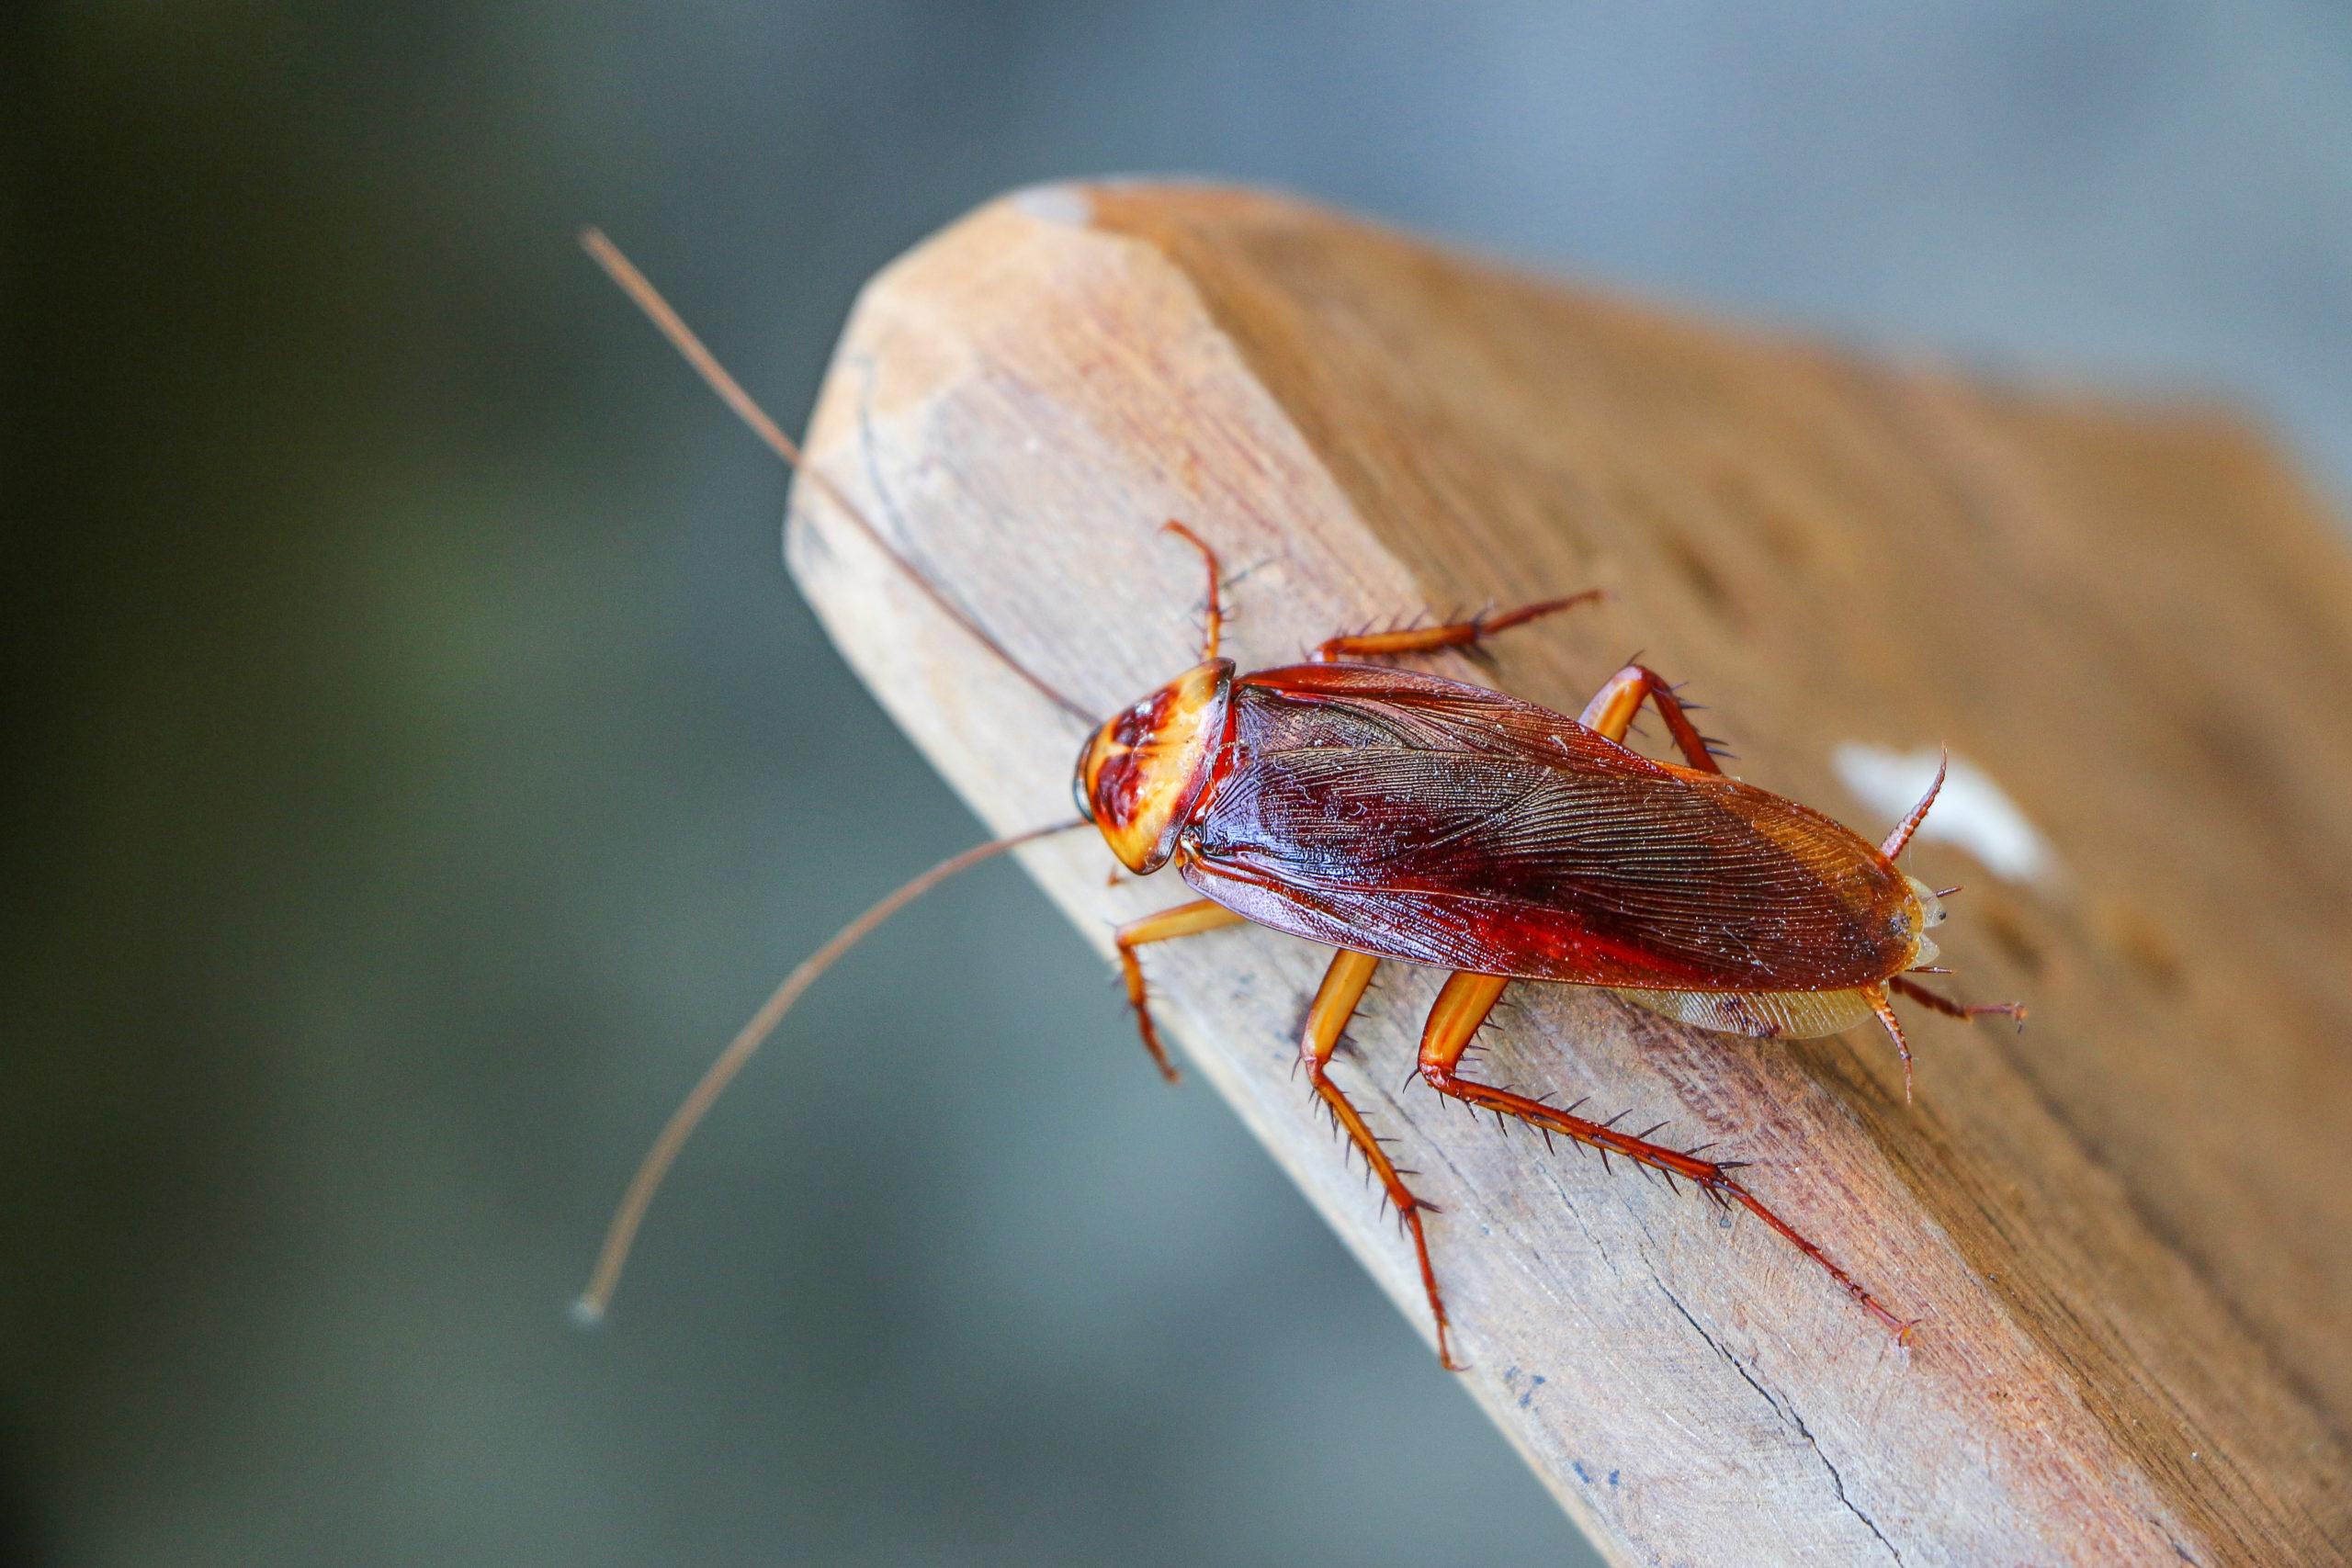 American Cockroach Control